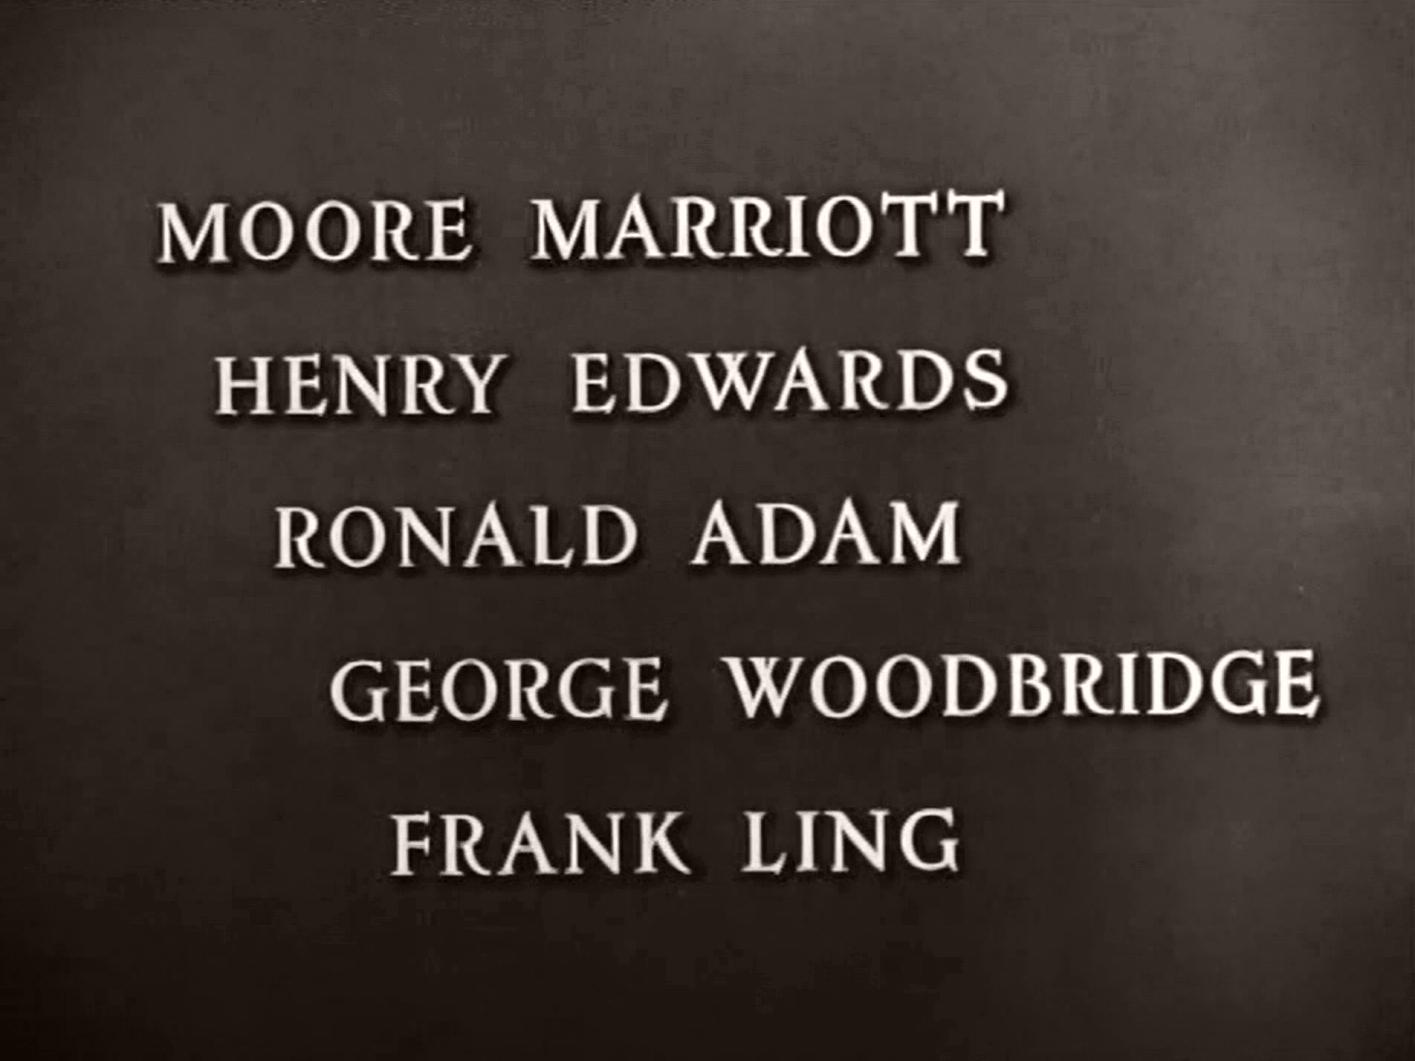 Main title from Green for Danger (1947) (5).  Moore Marriott Henry Edwards, Ronald Adam, George Woodbridge, Frank Ling